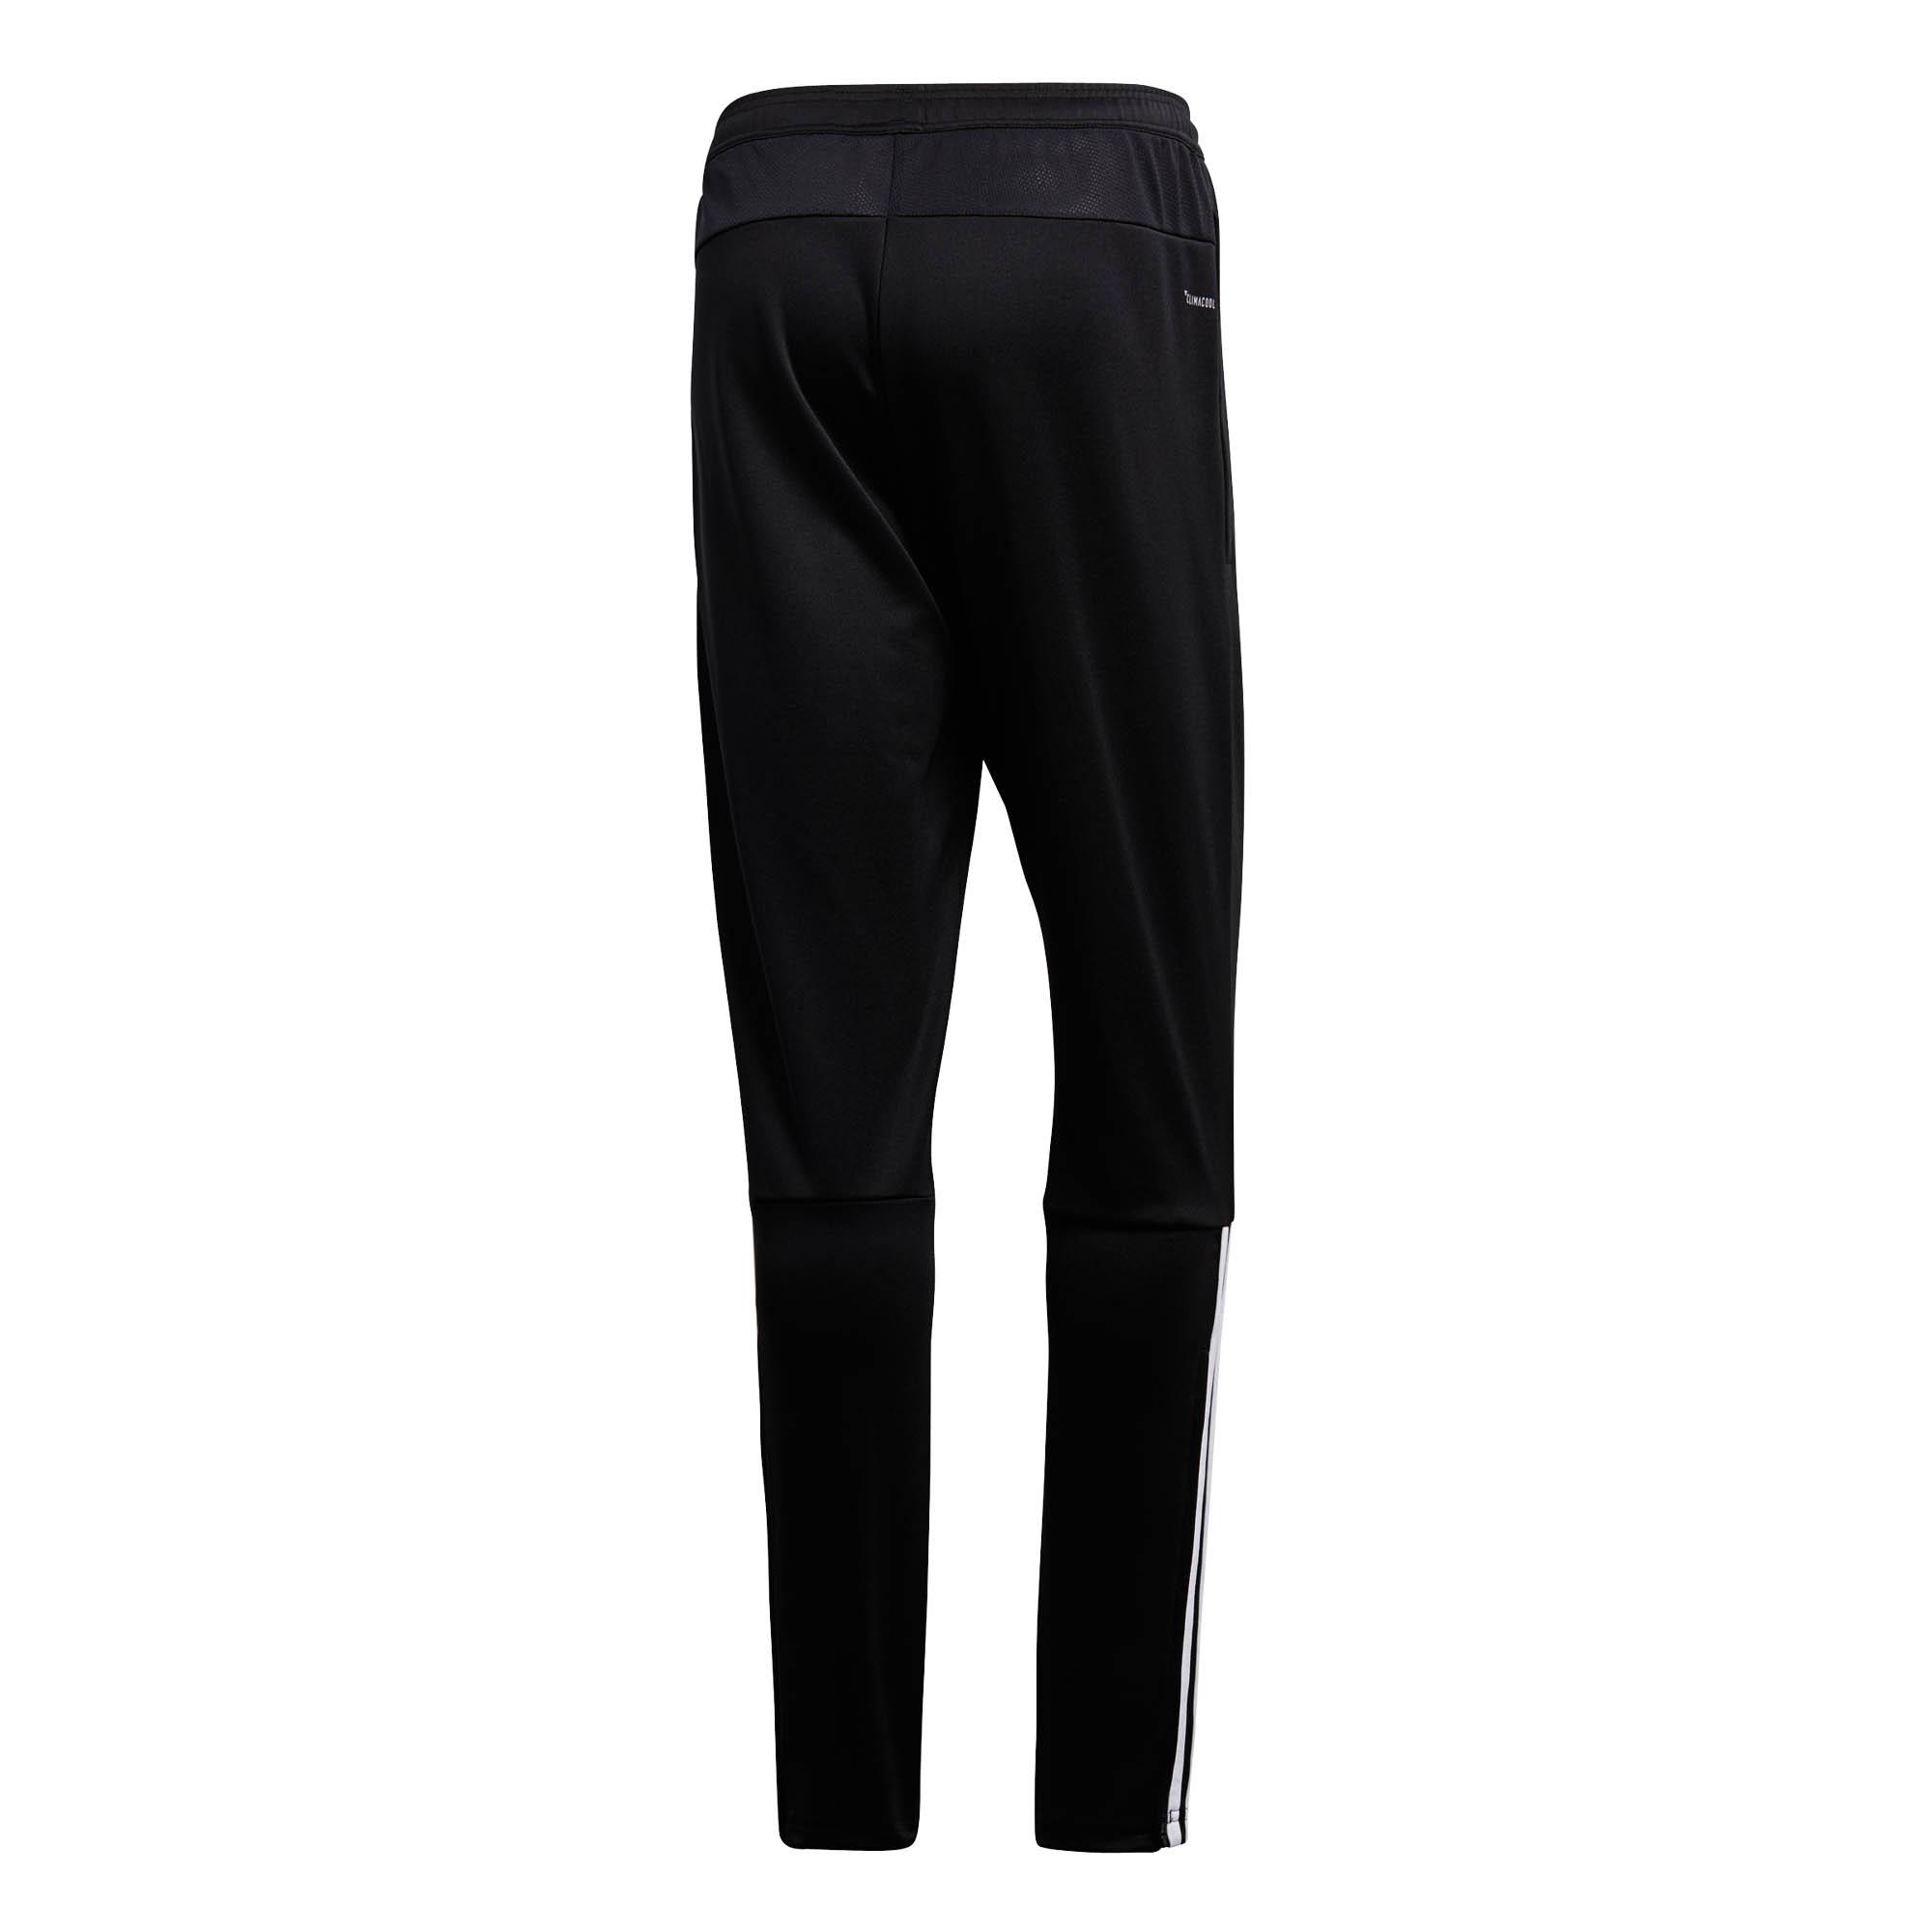 adidas-Regista-18-Mens-Tapered-Training-Tracksuit-Pant-Trouser-Black thumbnail 4